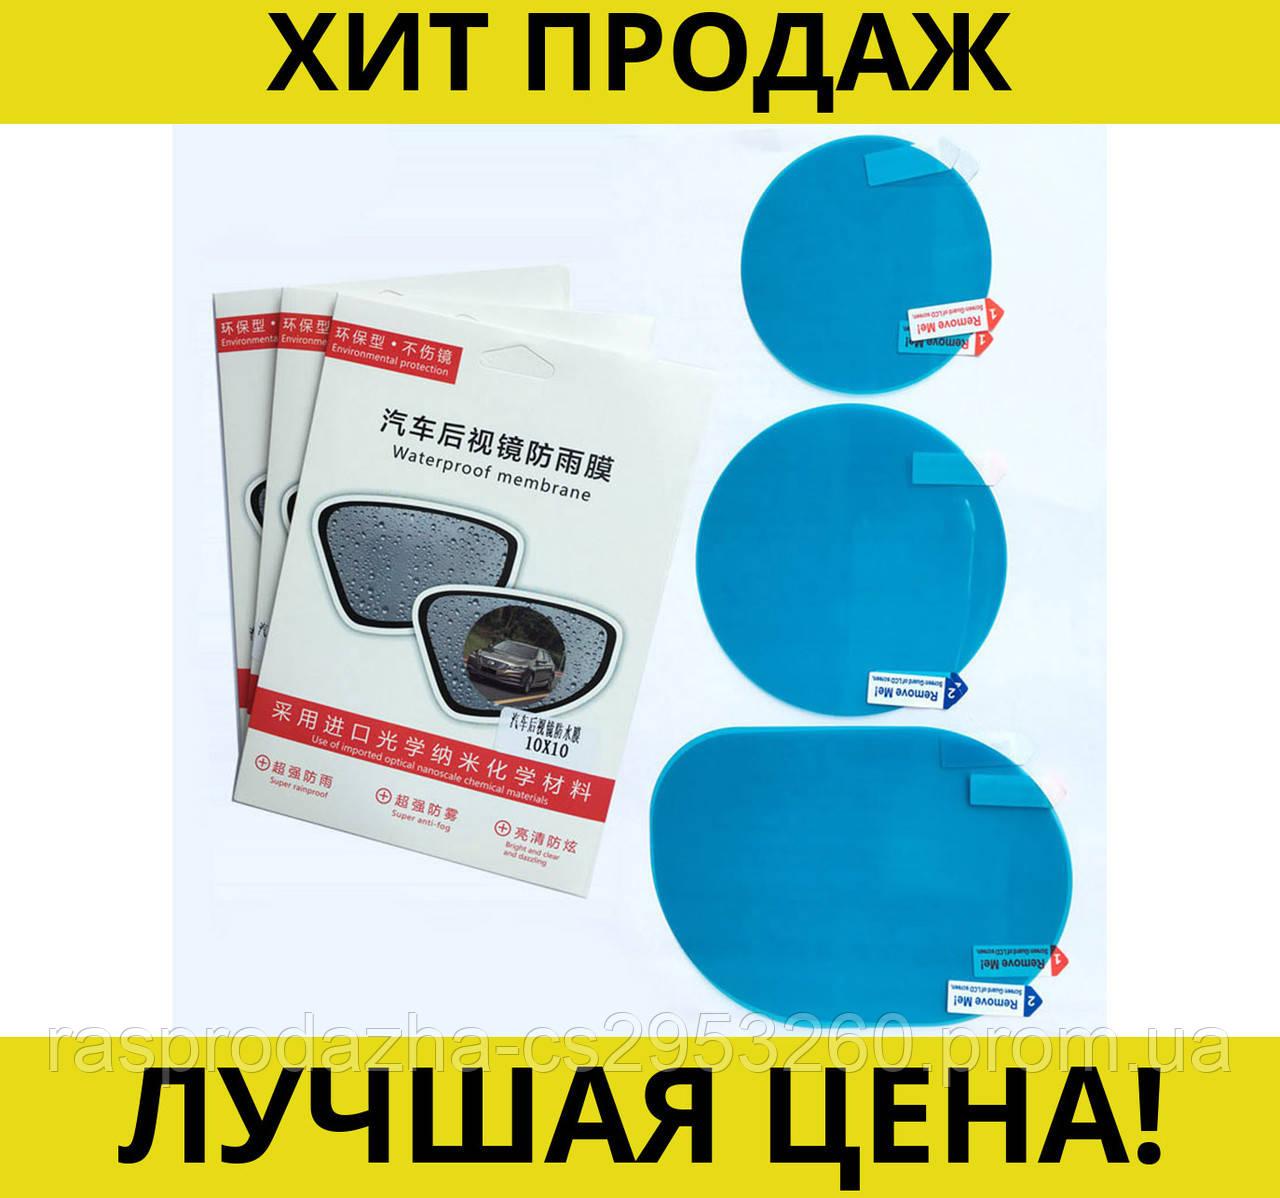 Пленка антидождь Waterproof Membrane 95*95!Спешите Купить